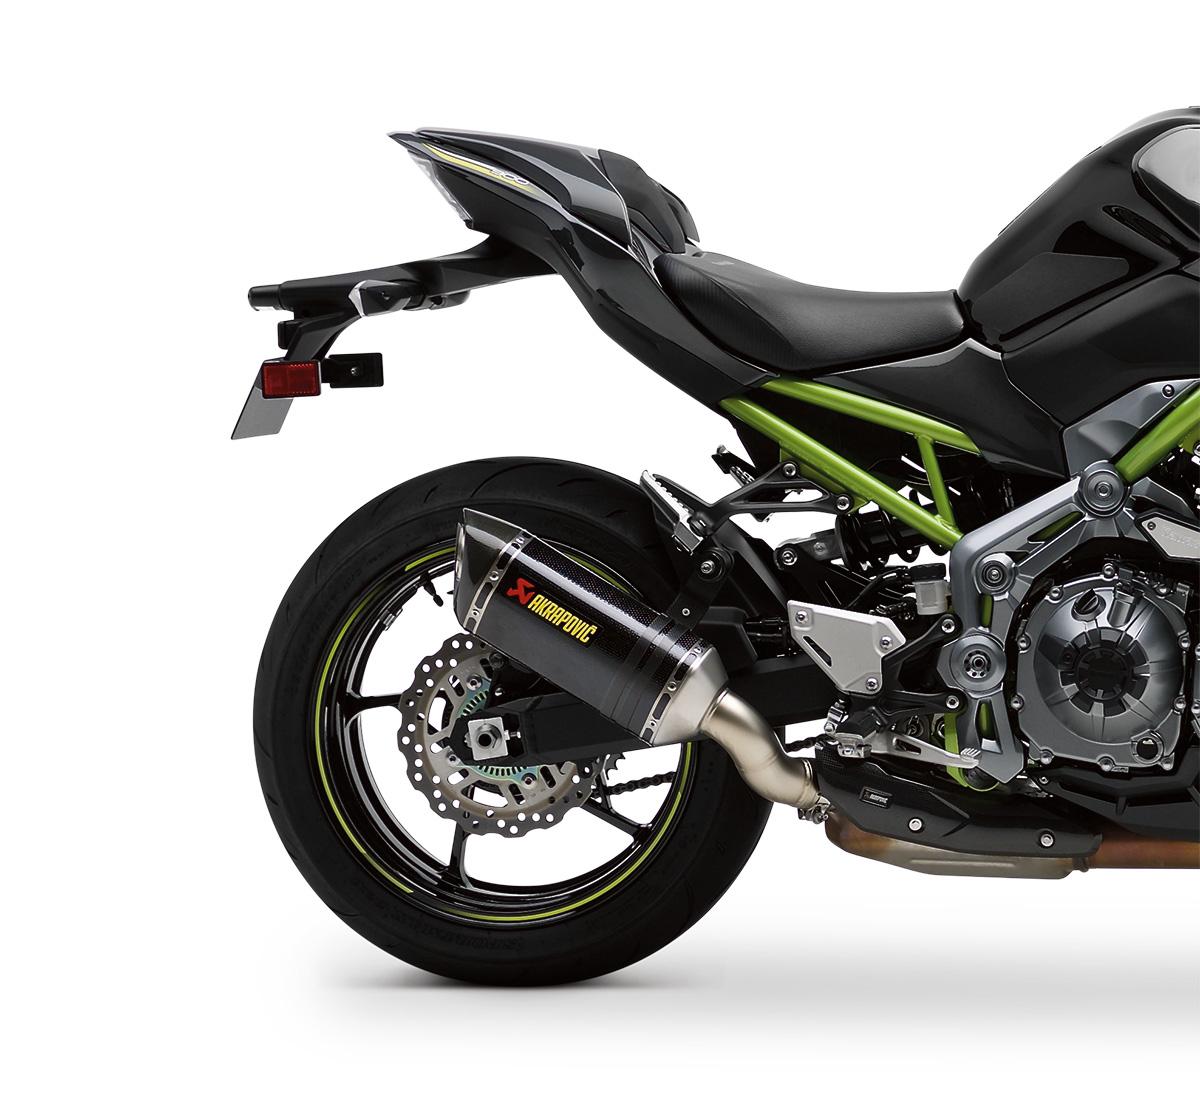 motorcycle akrapovic slip on exhaust. Black Bedroom Furniture Sets. Home Design Ideas